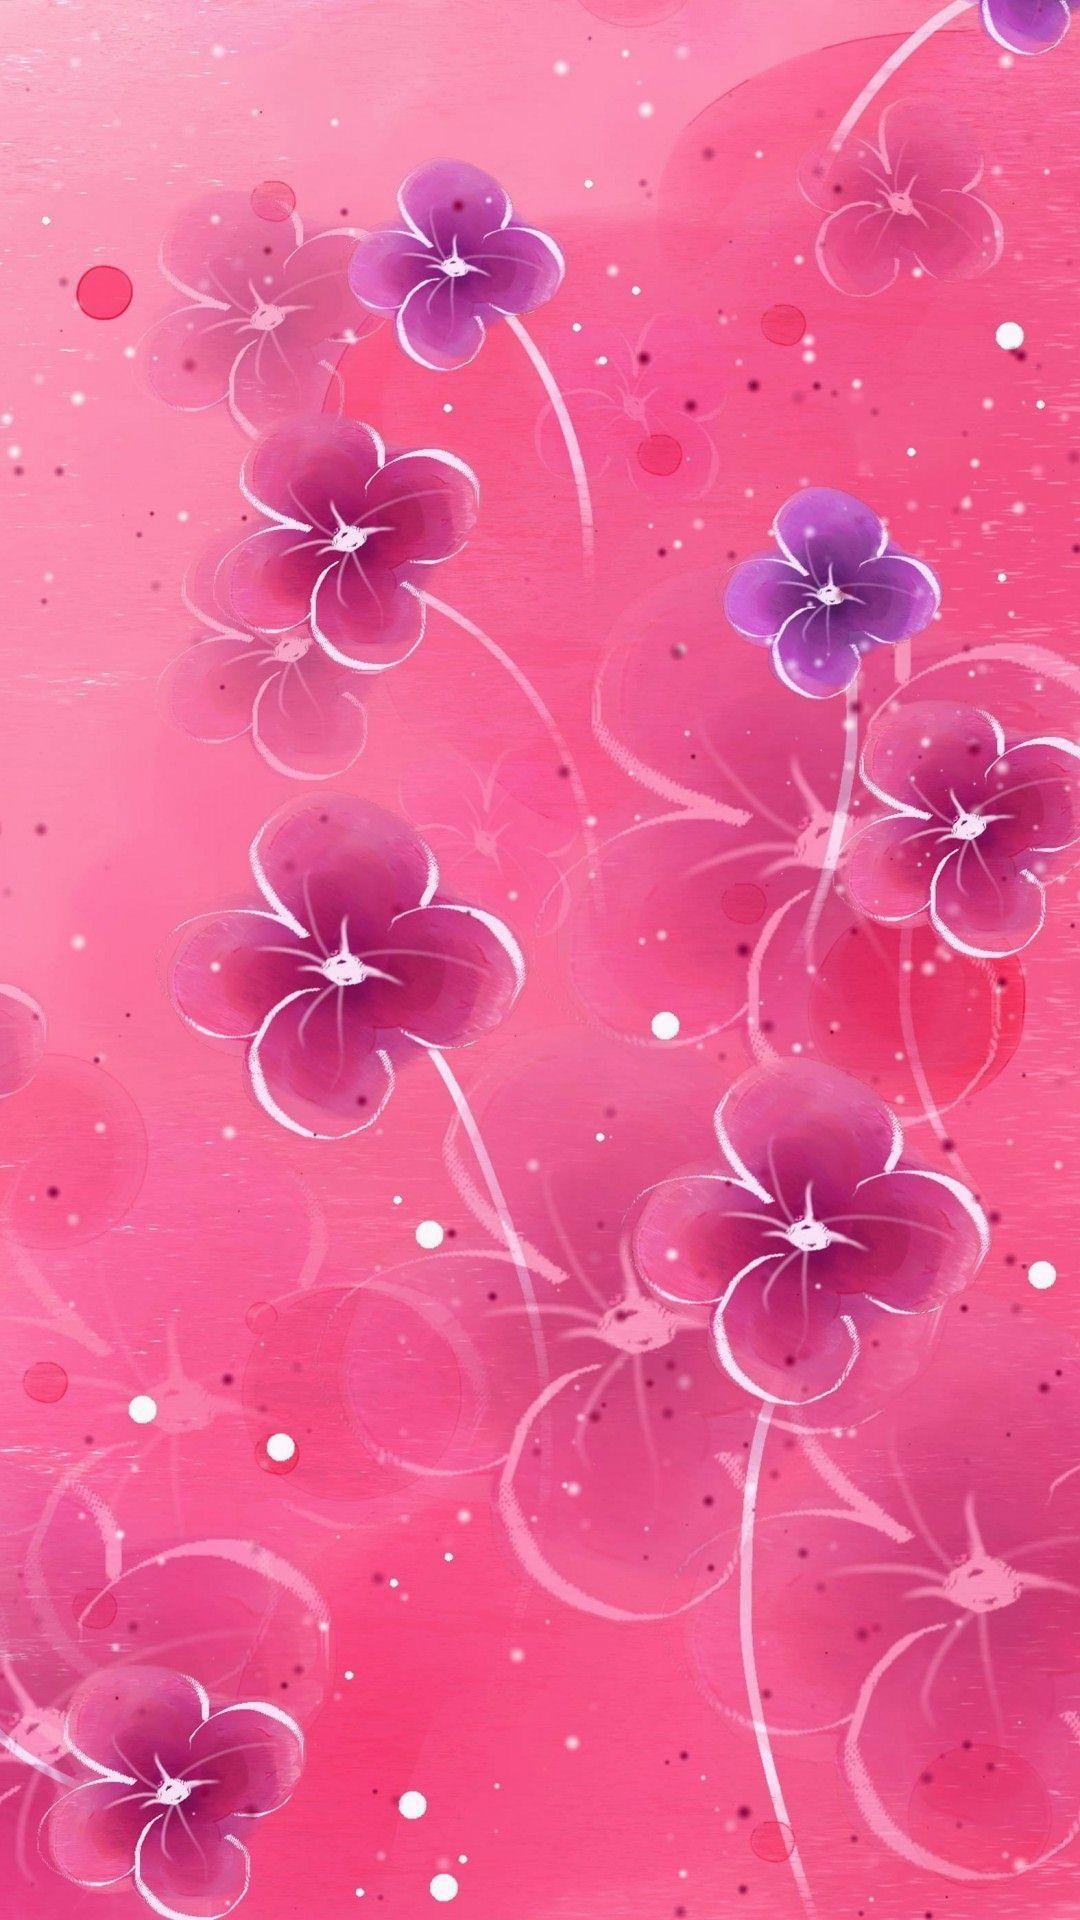 wallpaper.wiki-Pink-flower-iphone-wallpaper-PIC-WPD006671